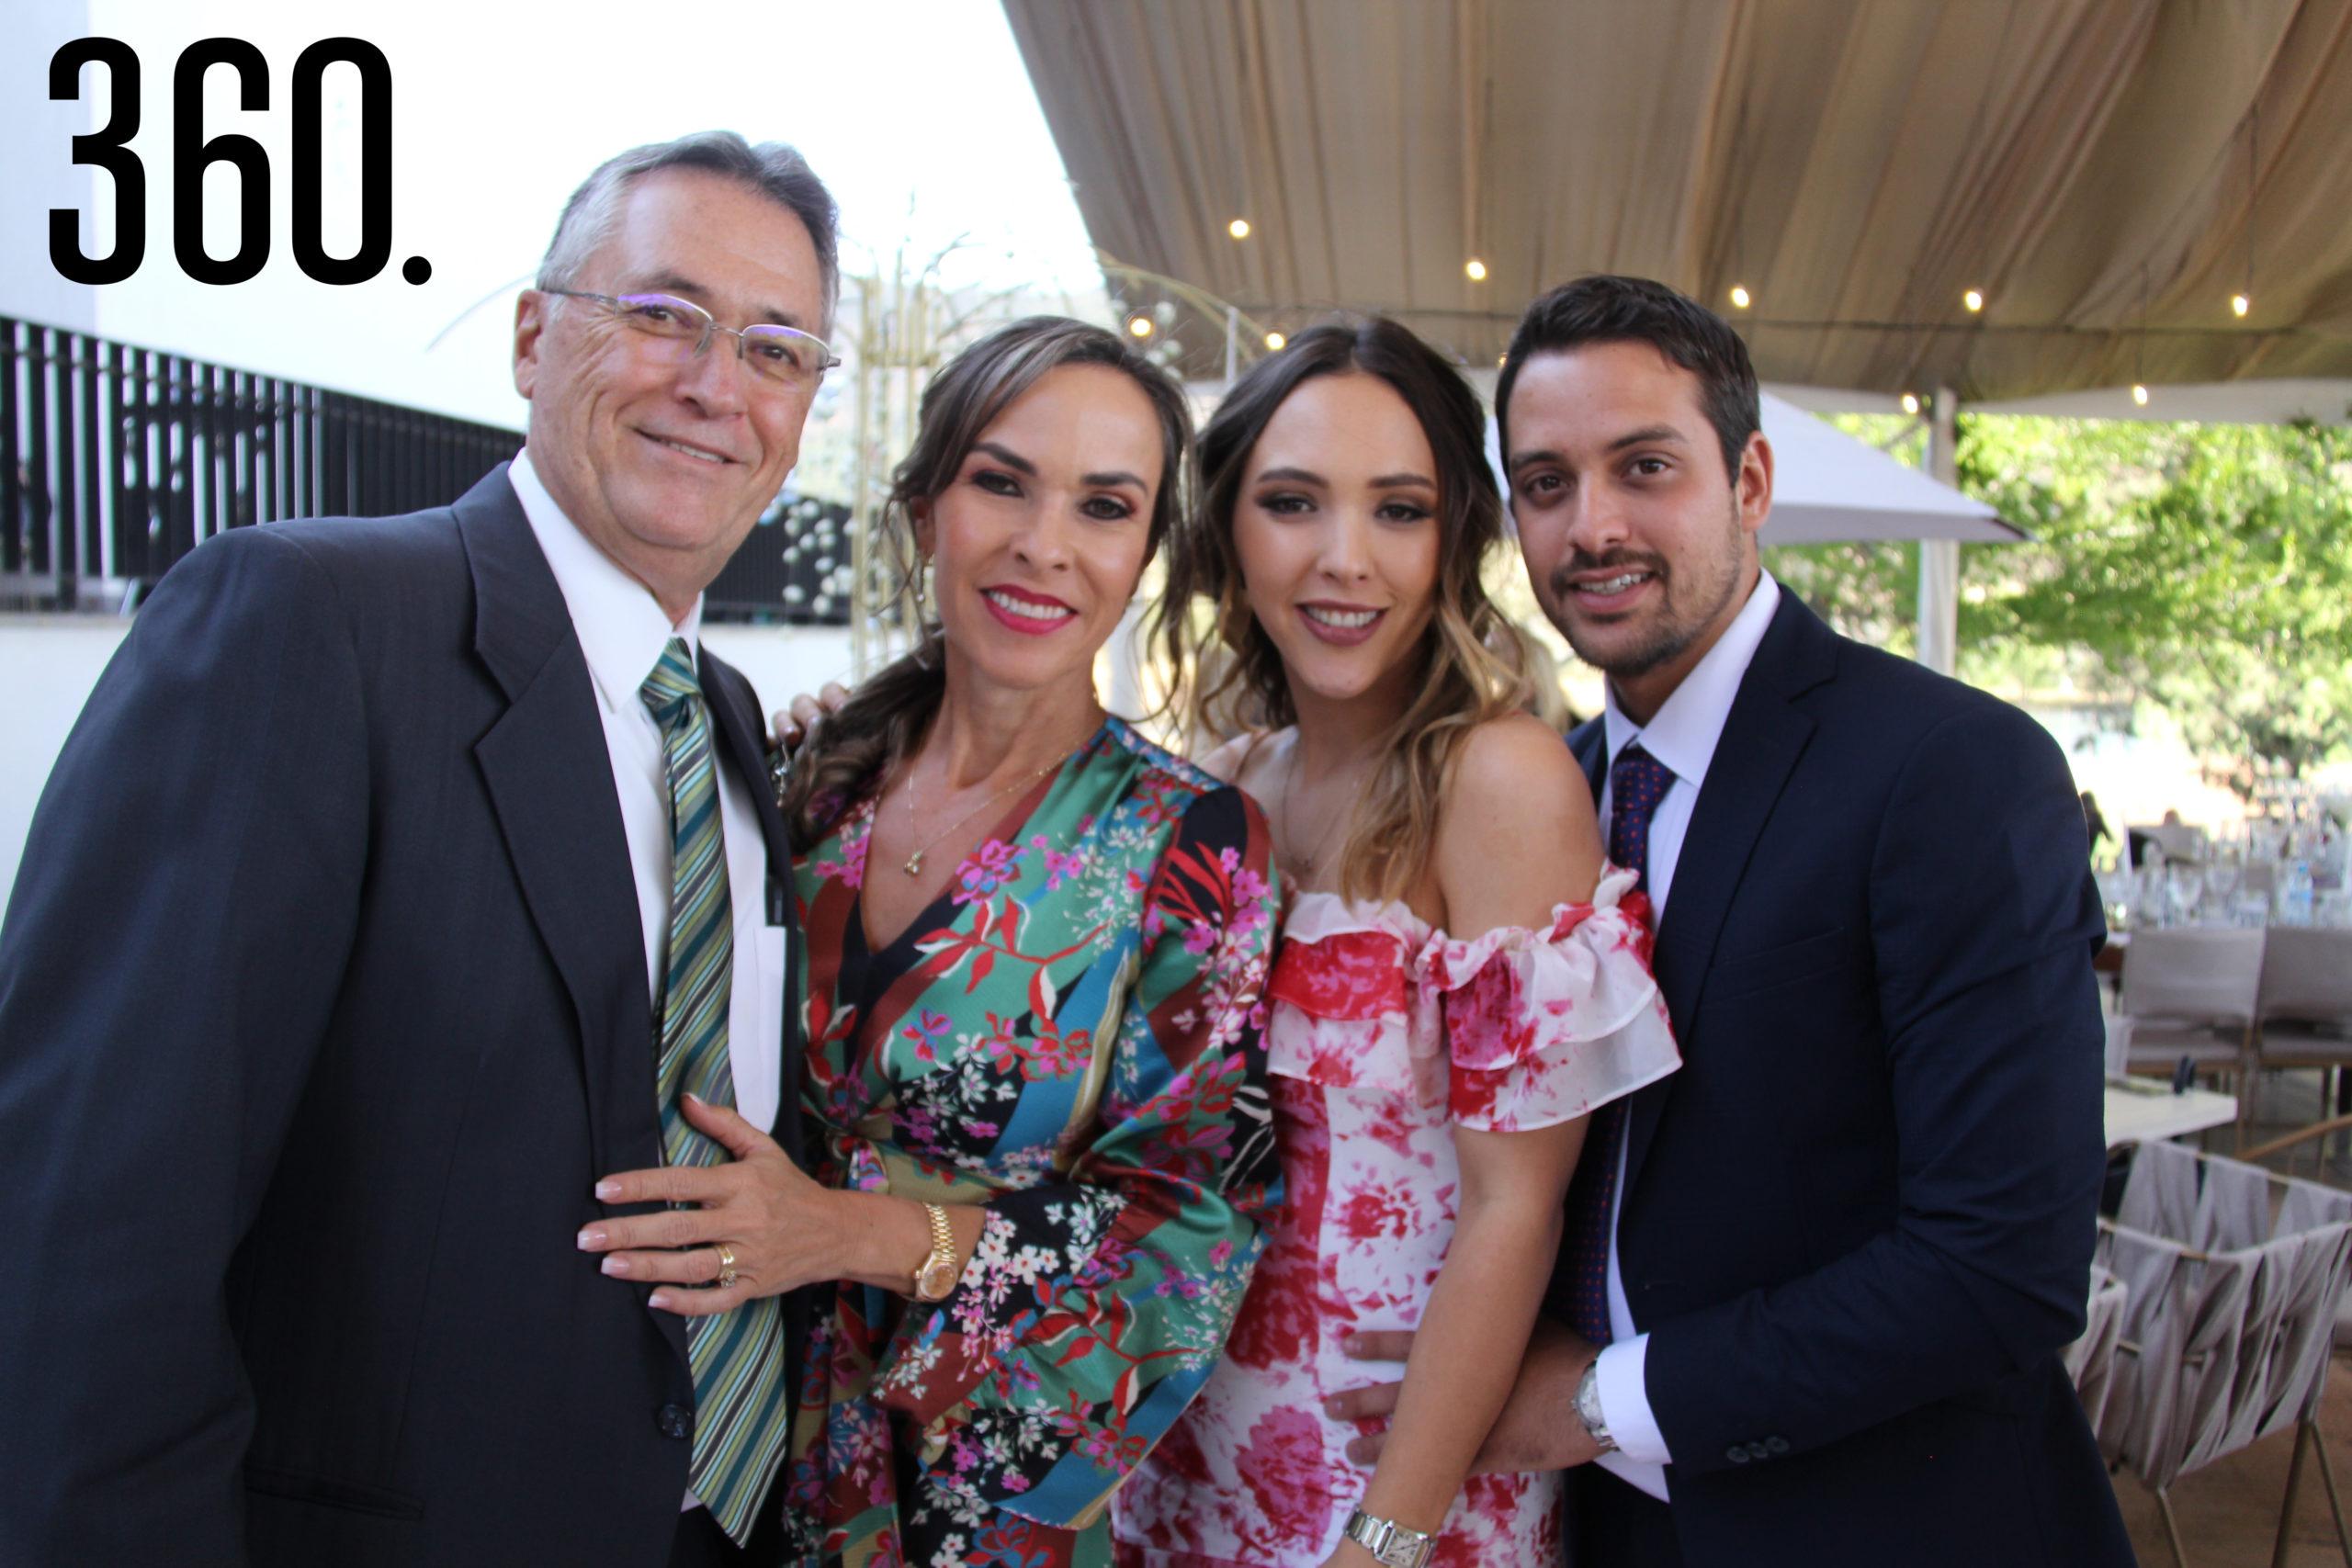 José Luis López, Melissa Möeller, Melissa López y Jesús de León Cardona.